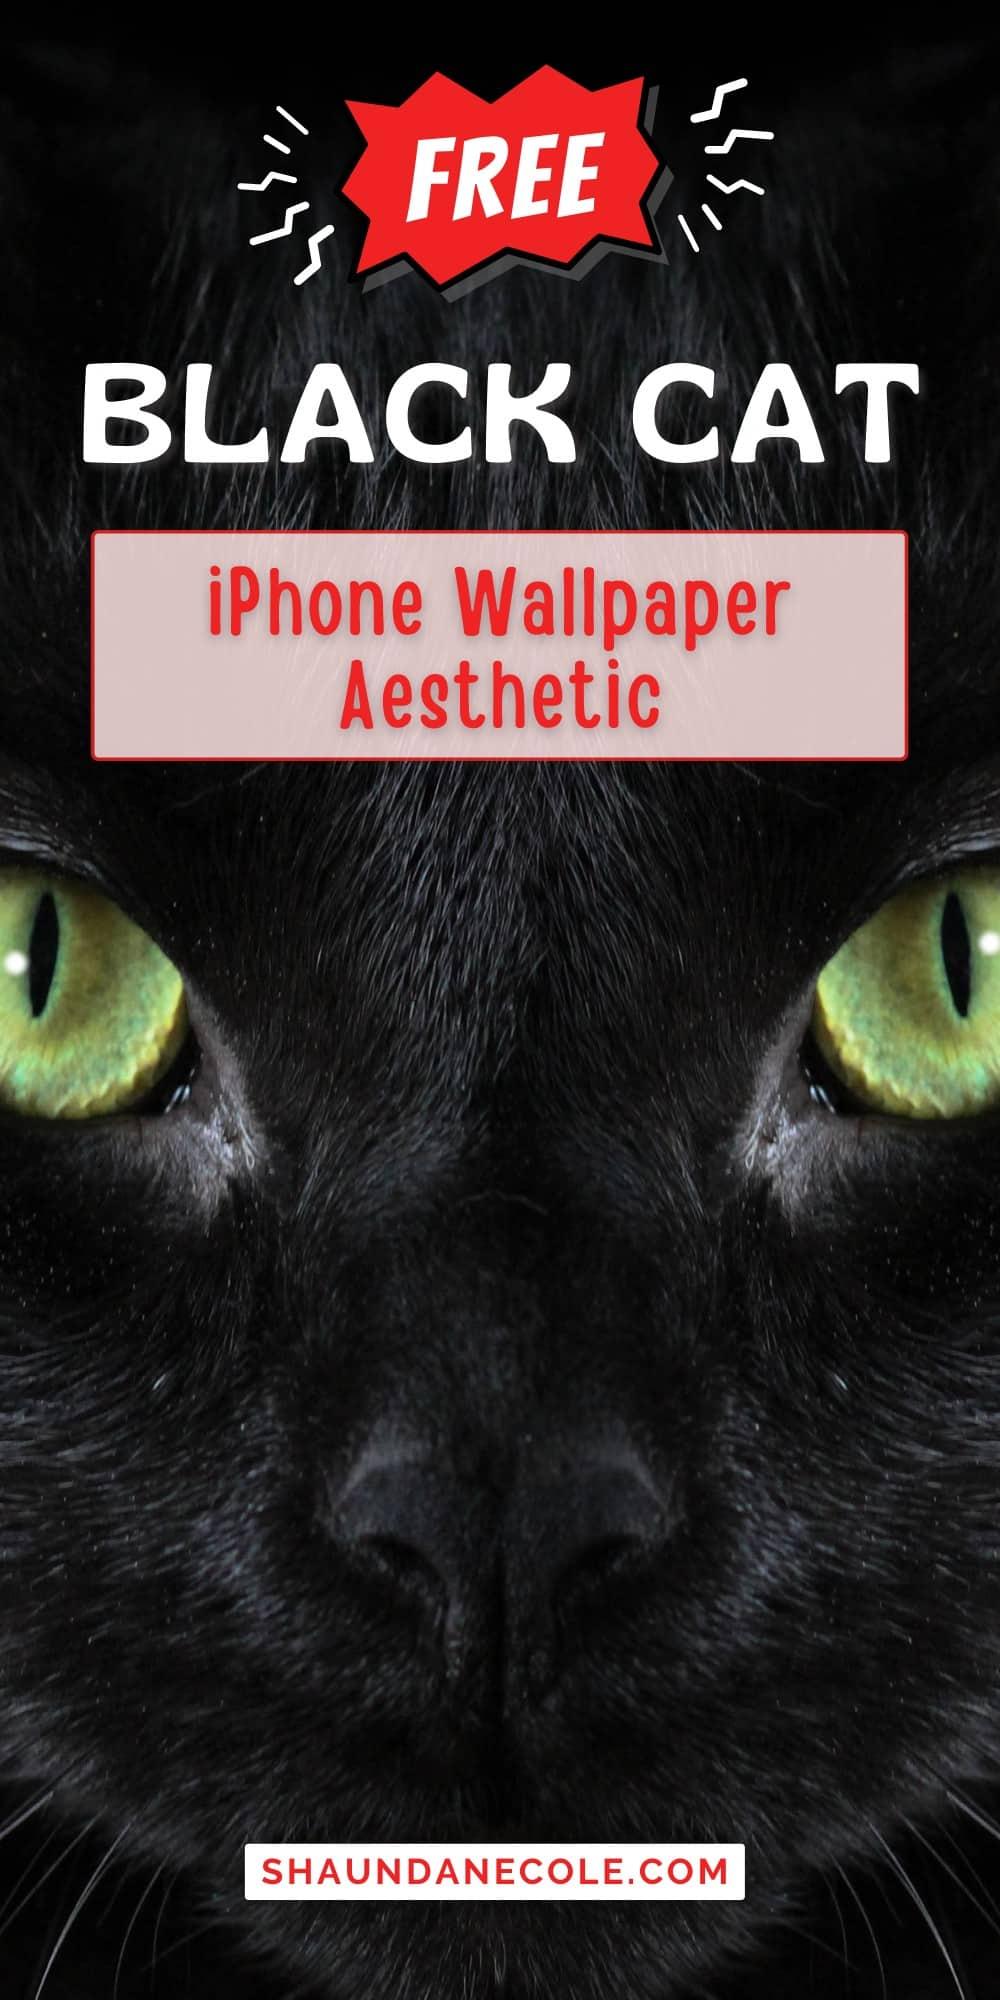 Free Black Cats Wallpaper iPhone Aesthetic Pinterest Pins